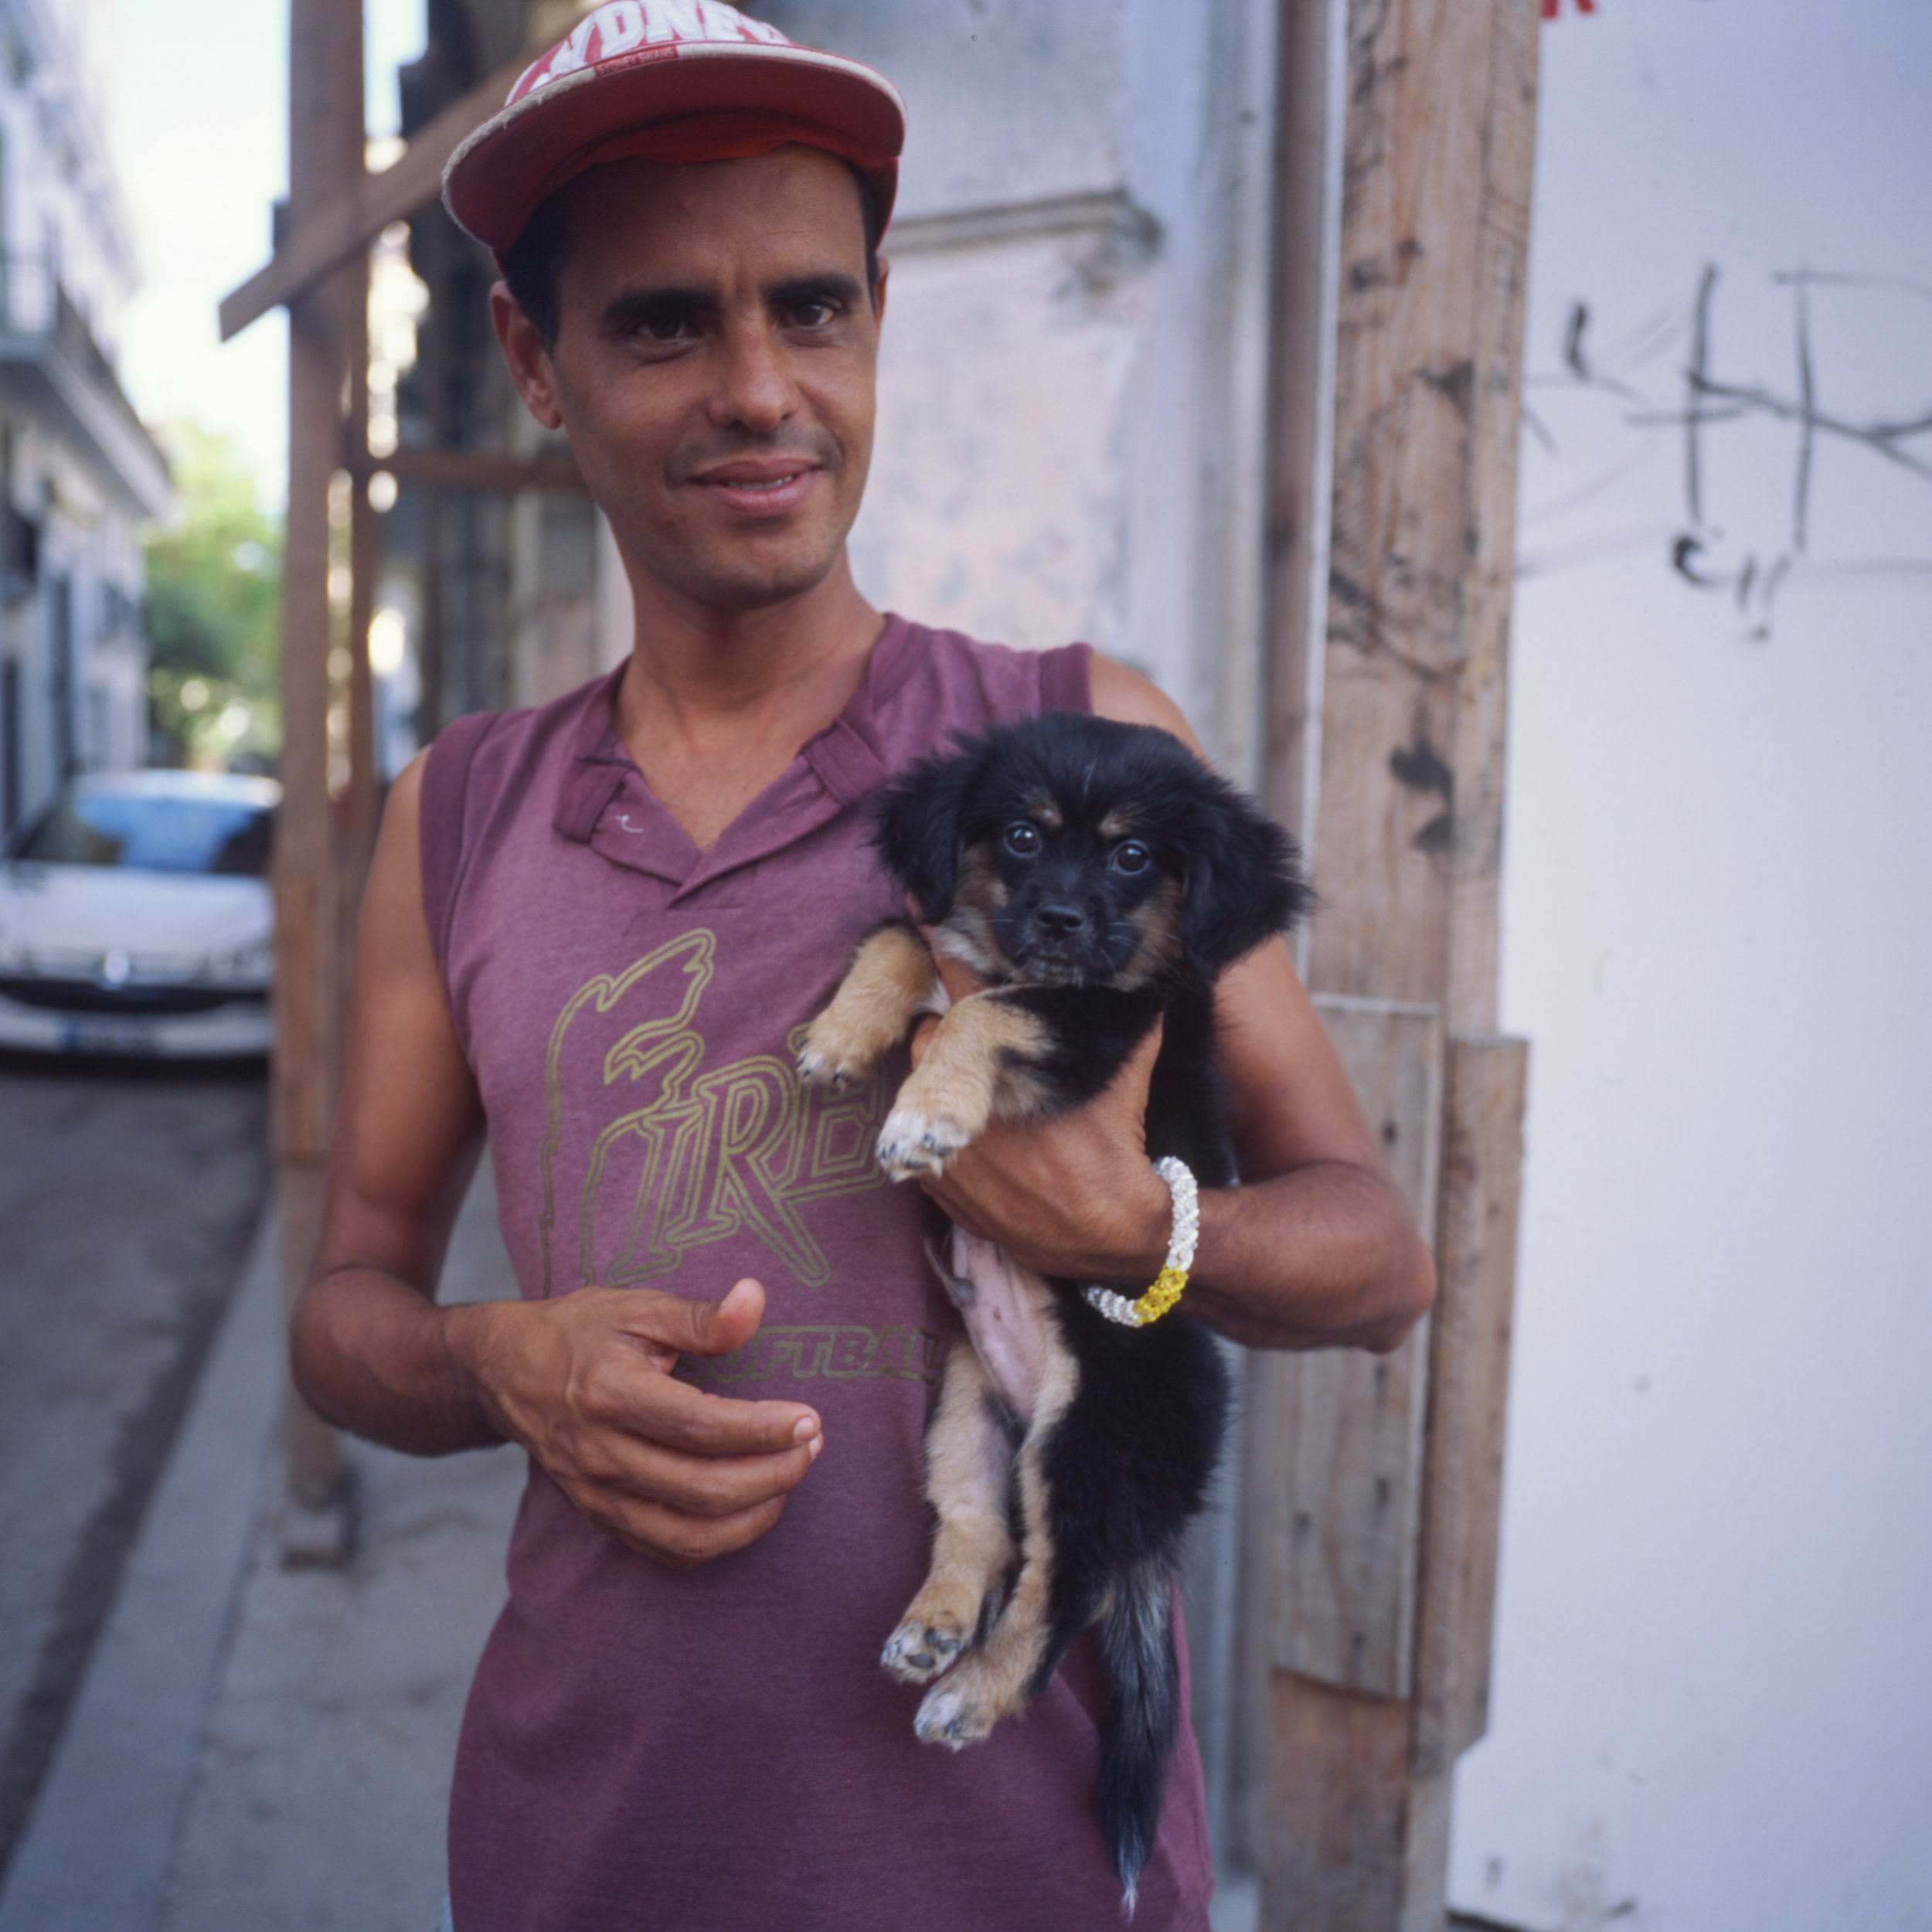 A guy and his doggo